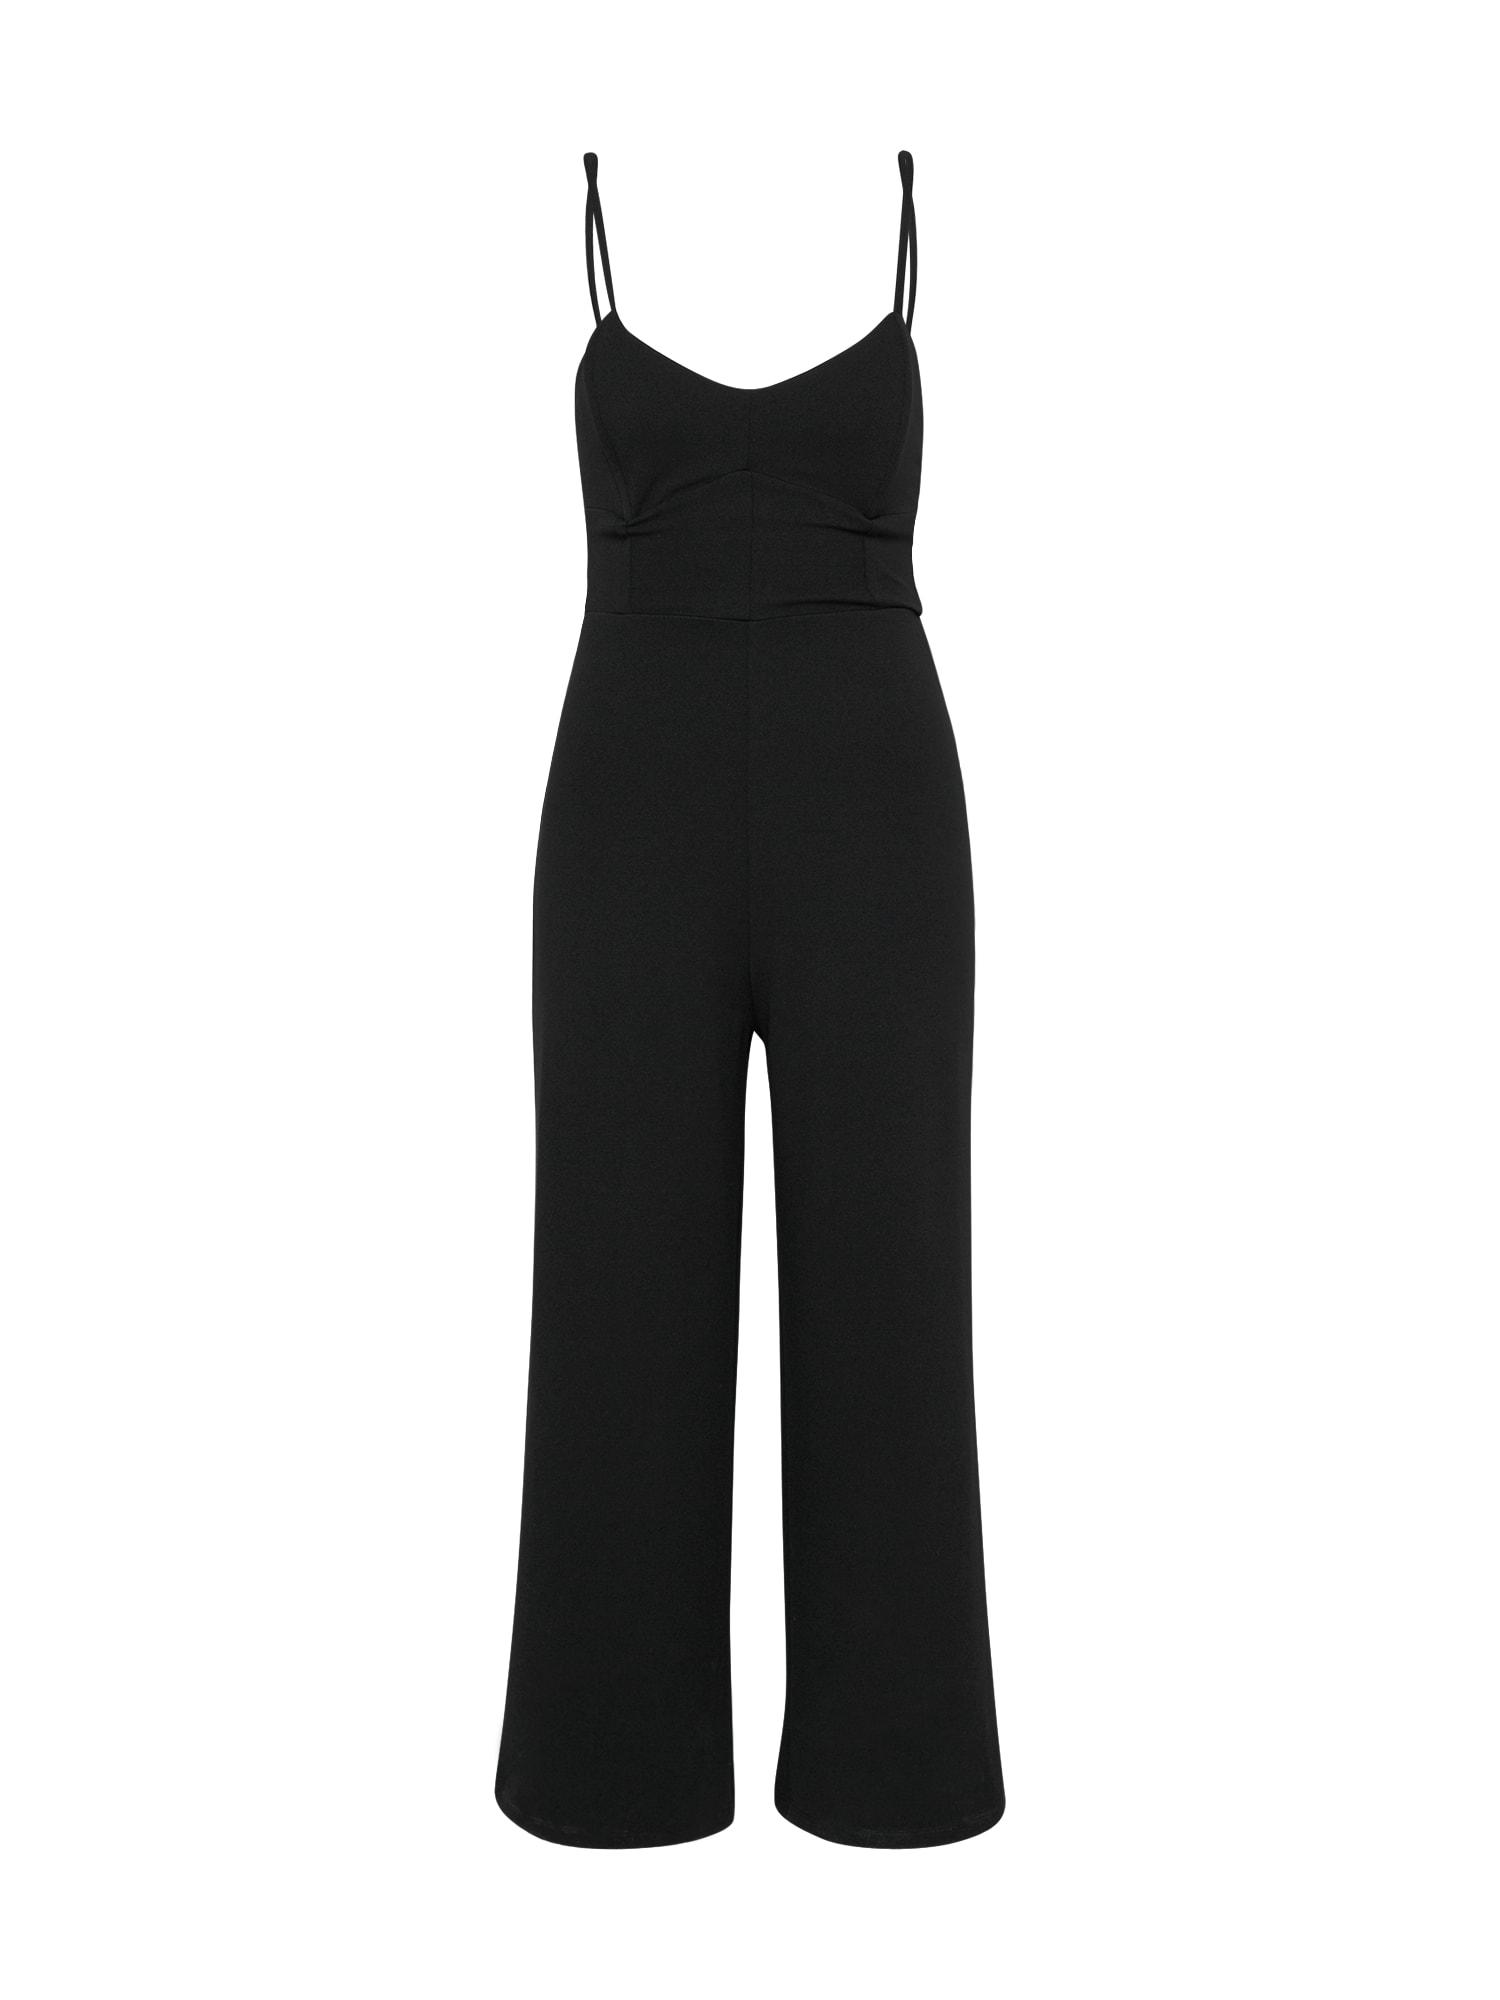 EDITED, Dames Jumpsuit 'Fibi', zwart